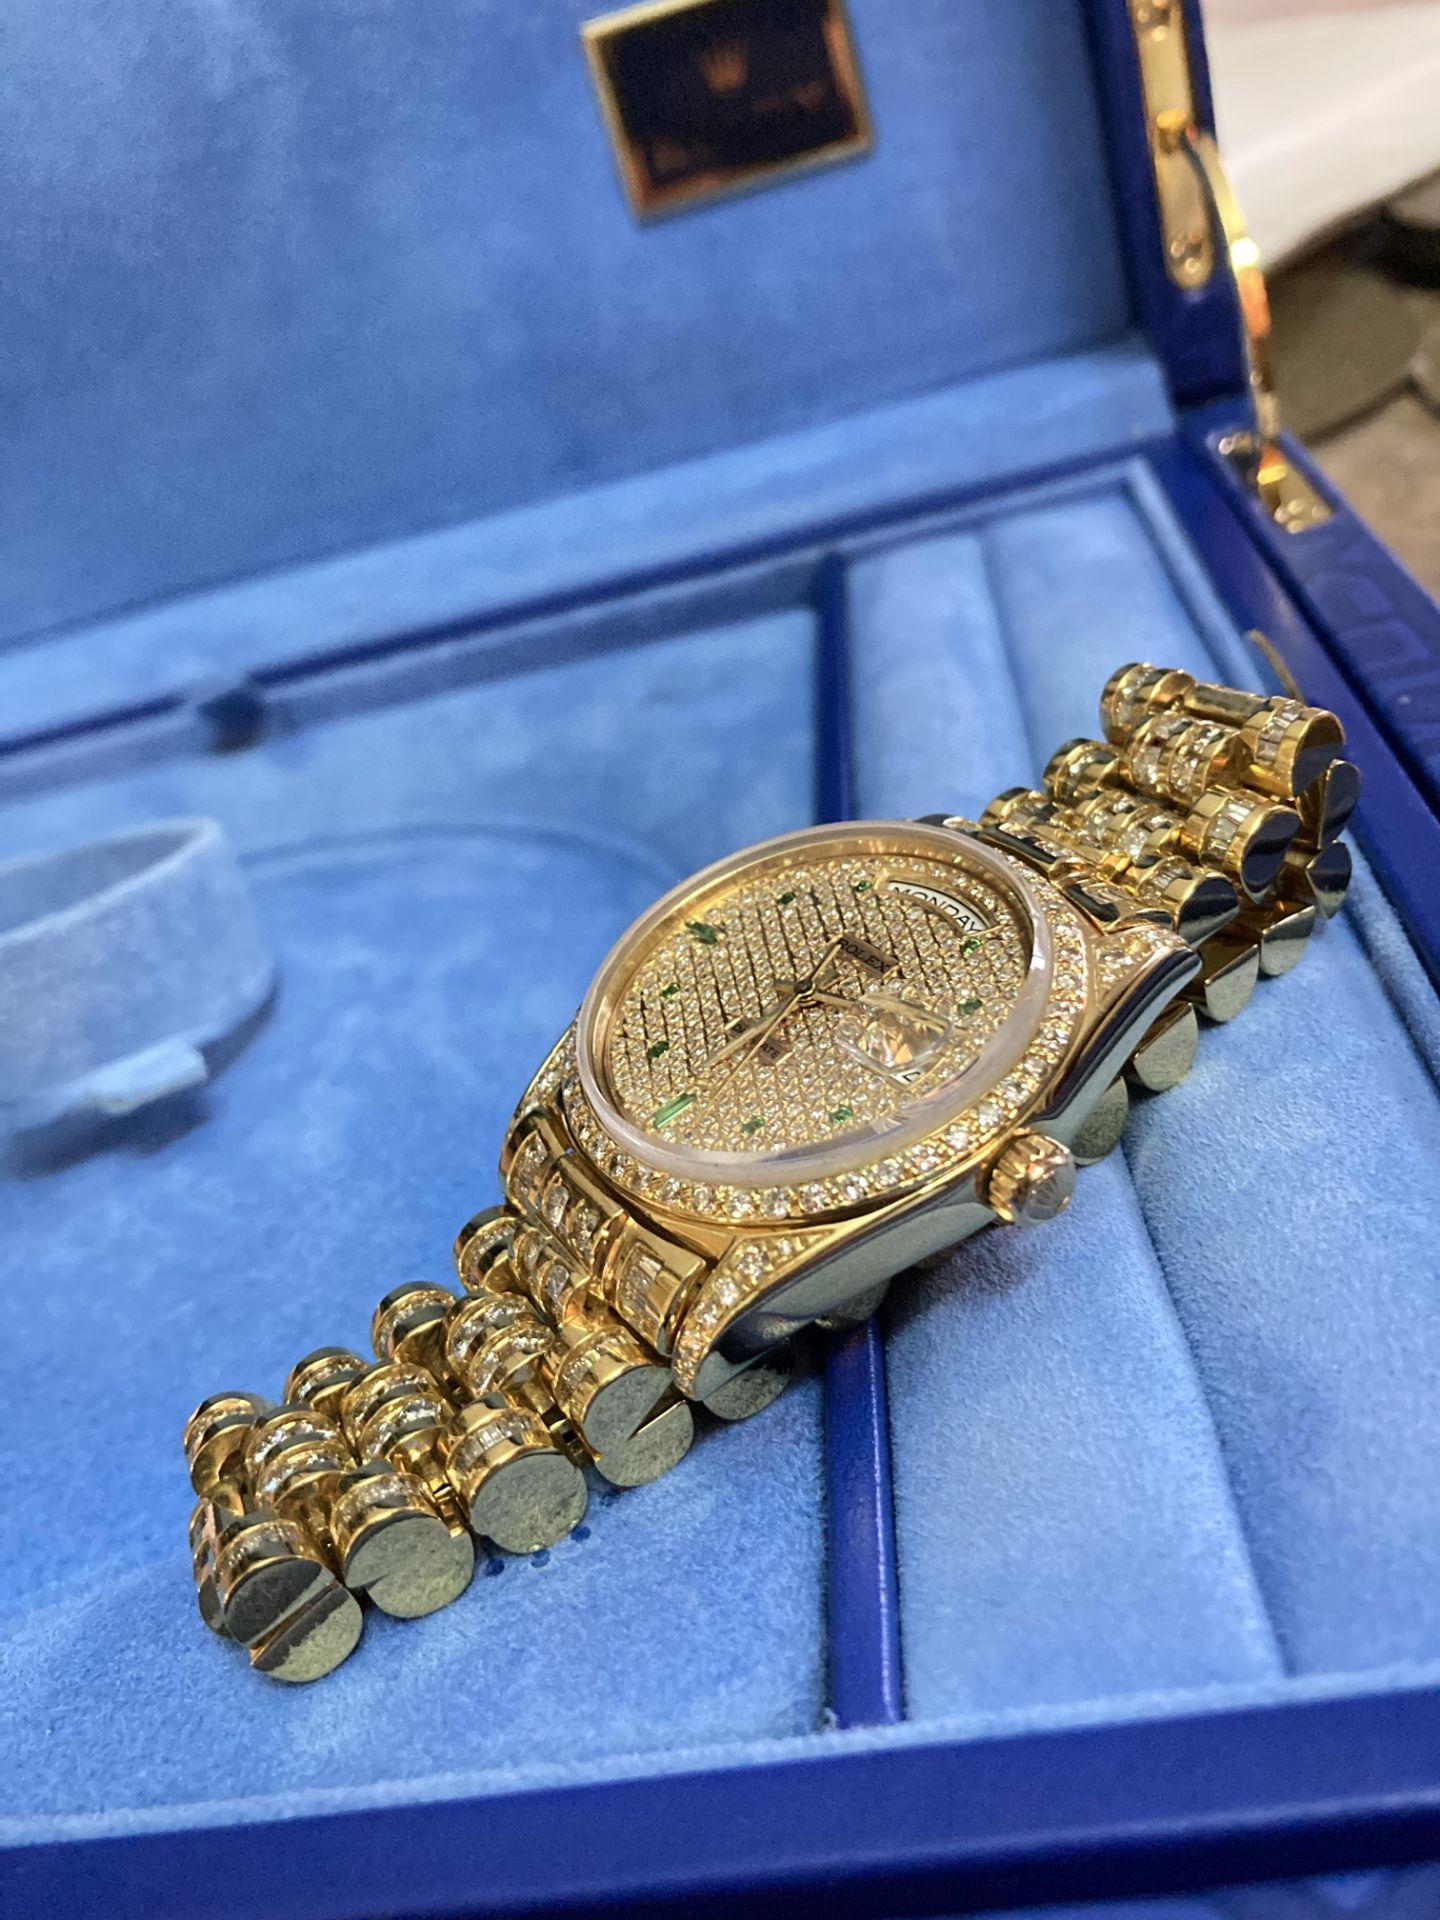 GENTS 36mm ROLEX DAYDATE YELLOW GOLD DIAMOND WATCH - Image 13 of 21